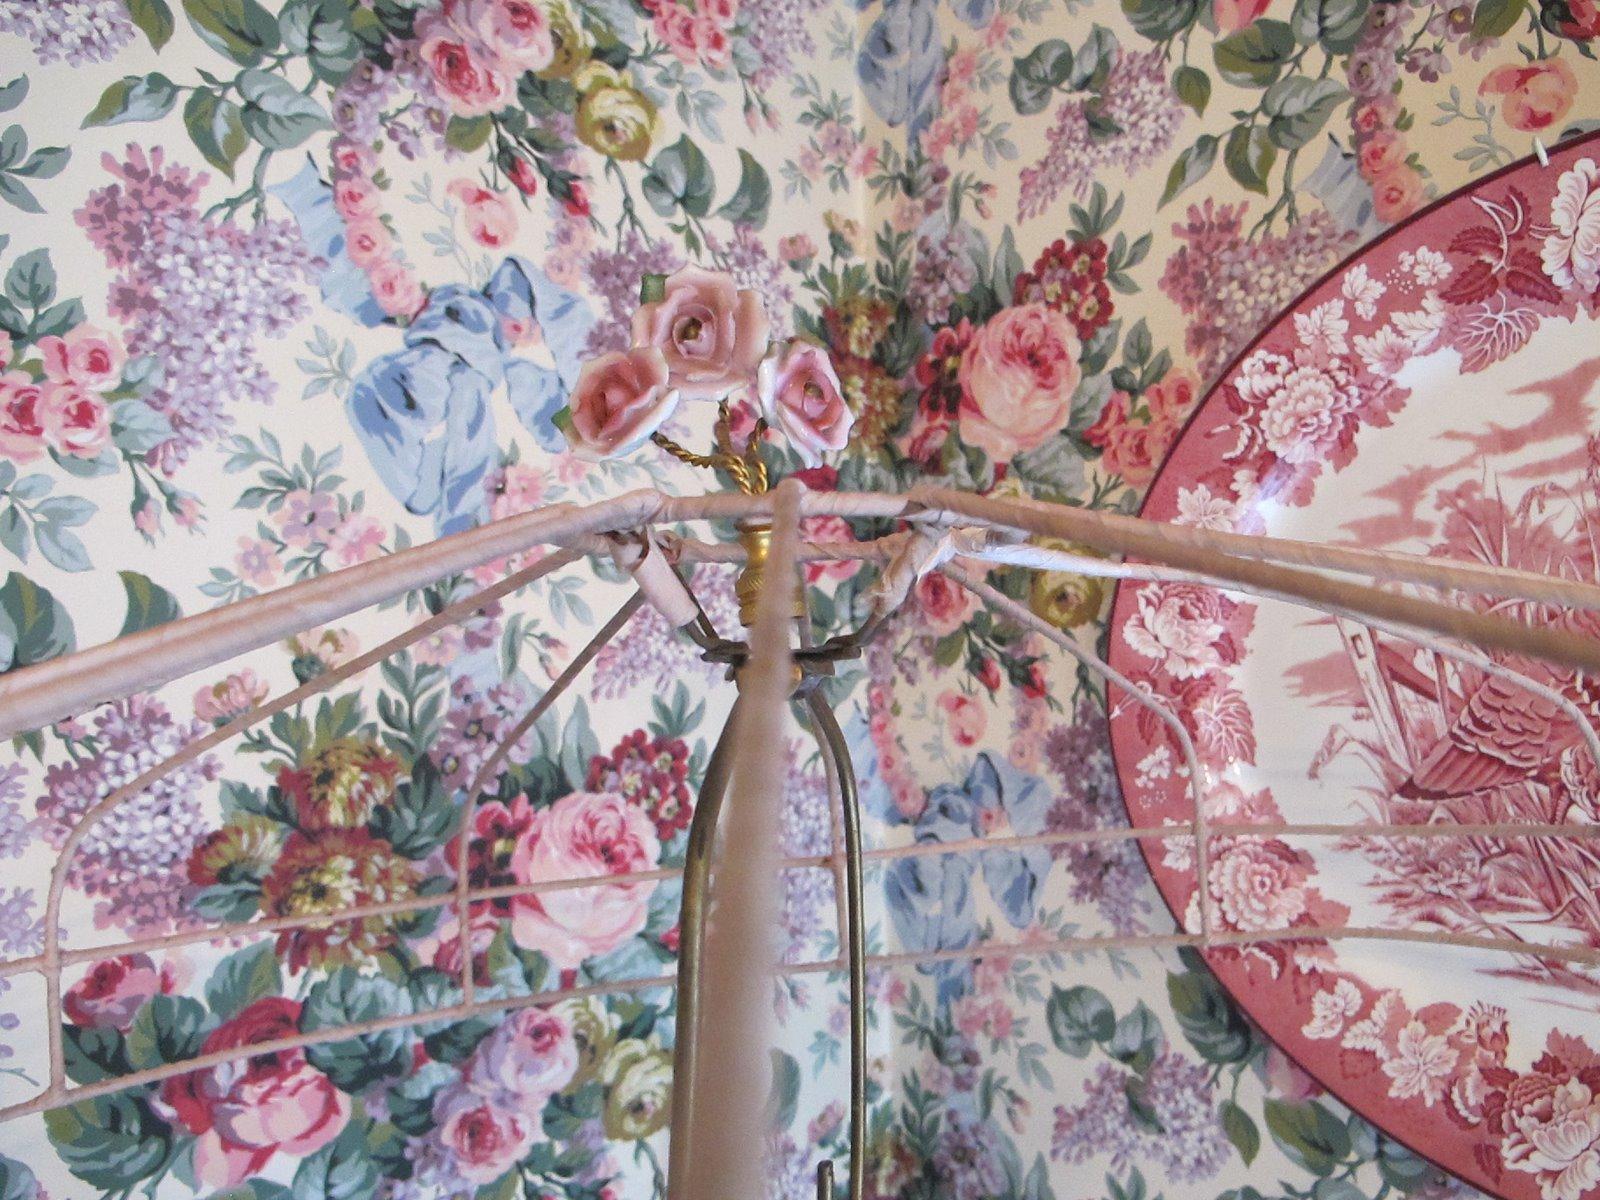 [49+] Ralph Lauren Paisley Wallpaper Border on WallpaperSafari